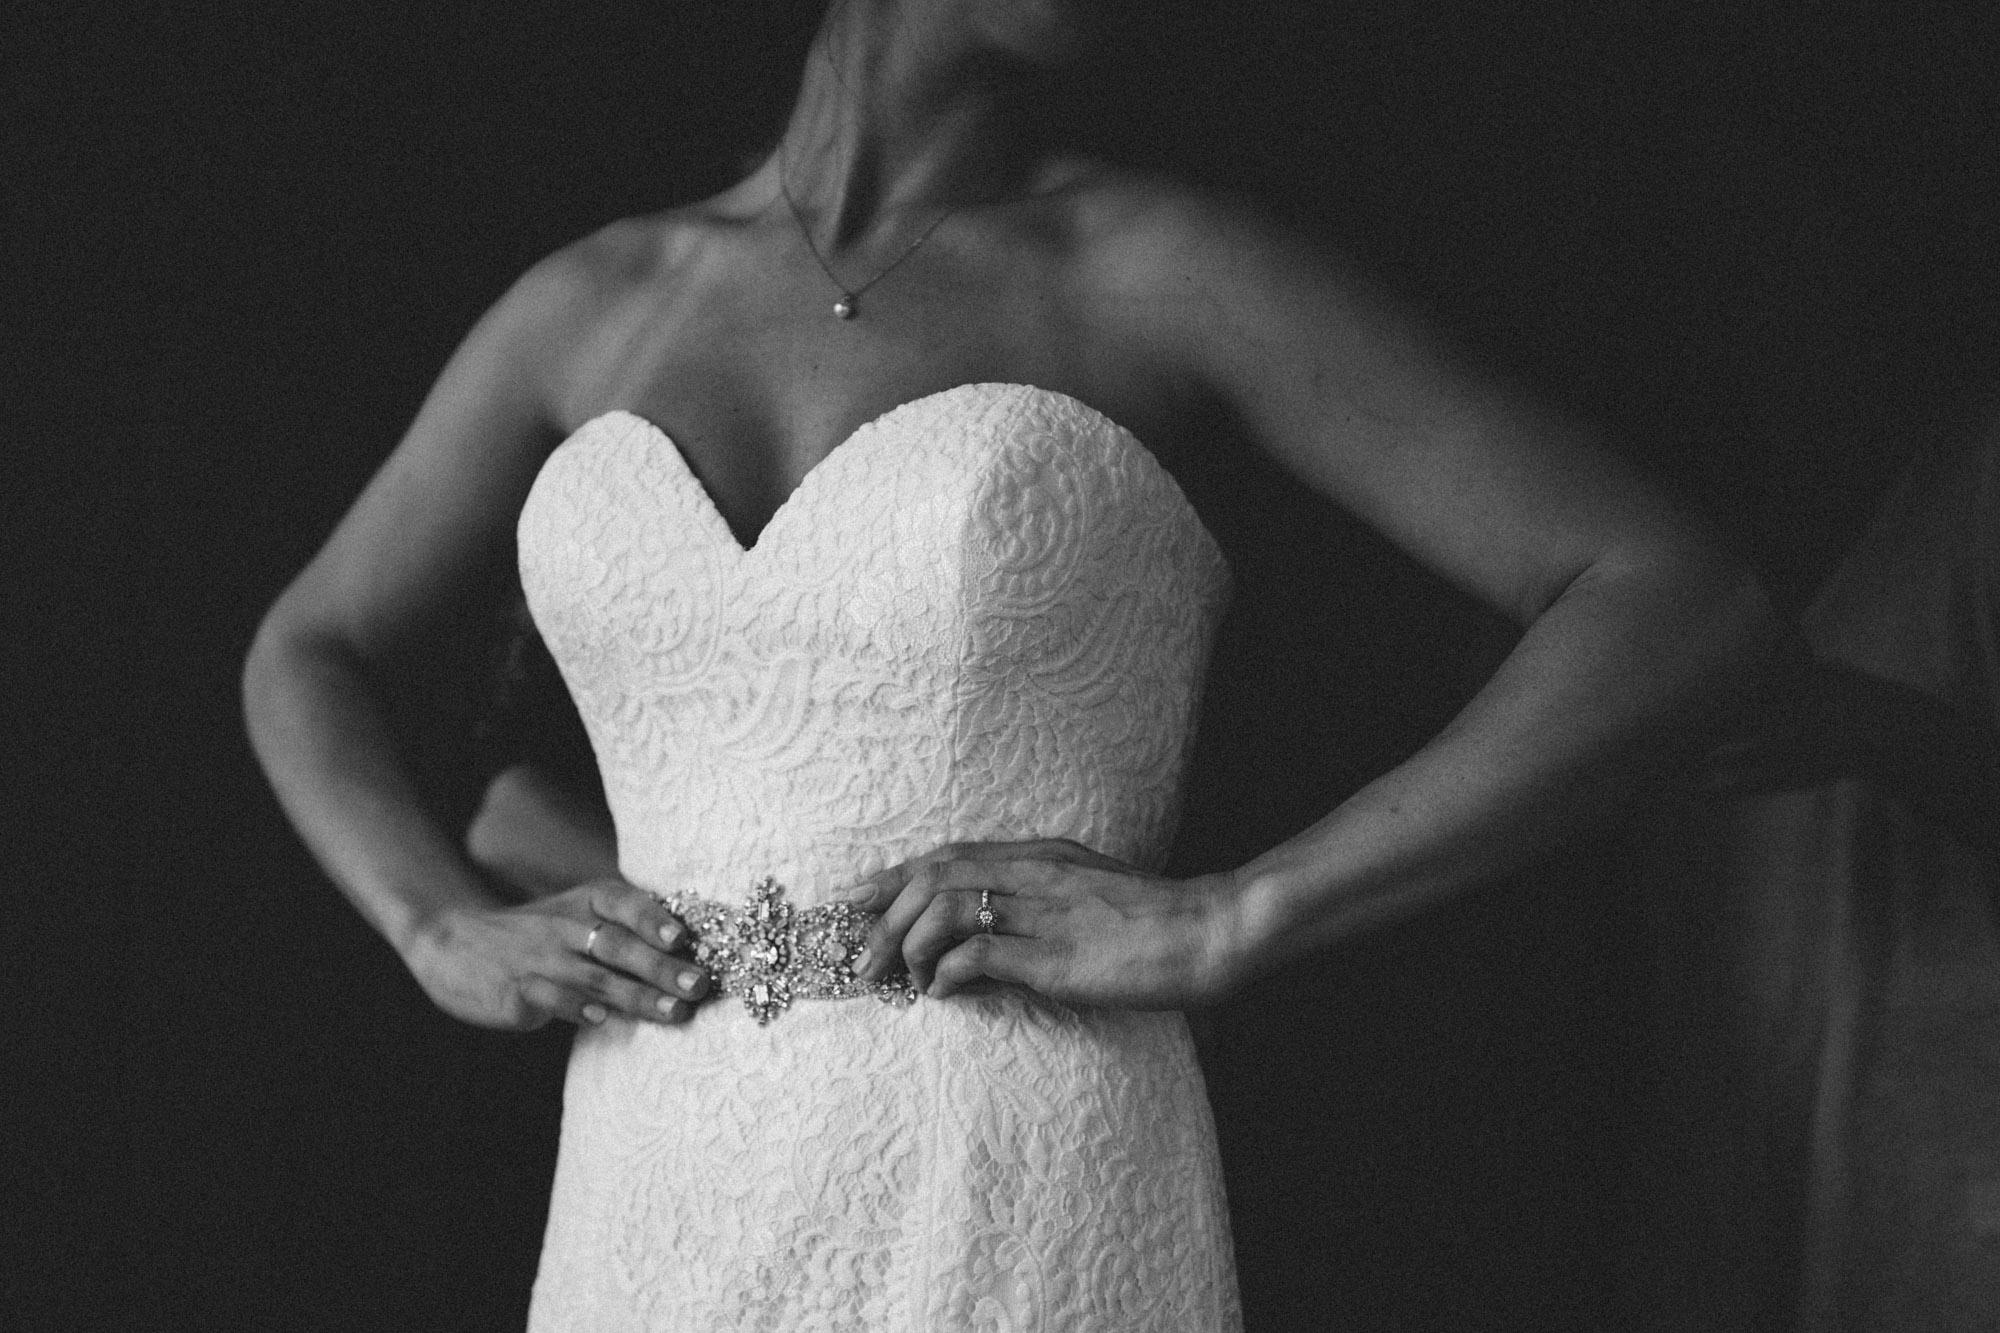 Contemporary wedding photography by Britt DeZeeuw, Grand View Lodge wedding photographer.